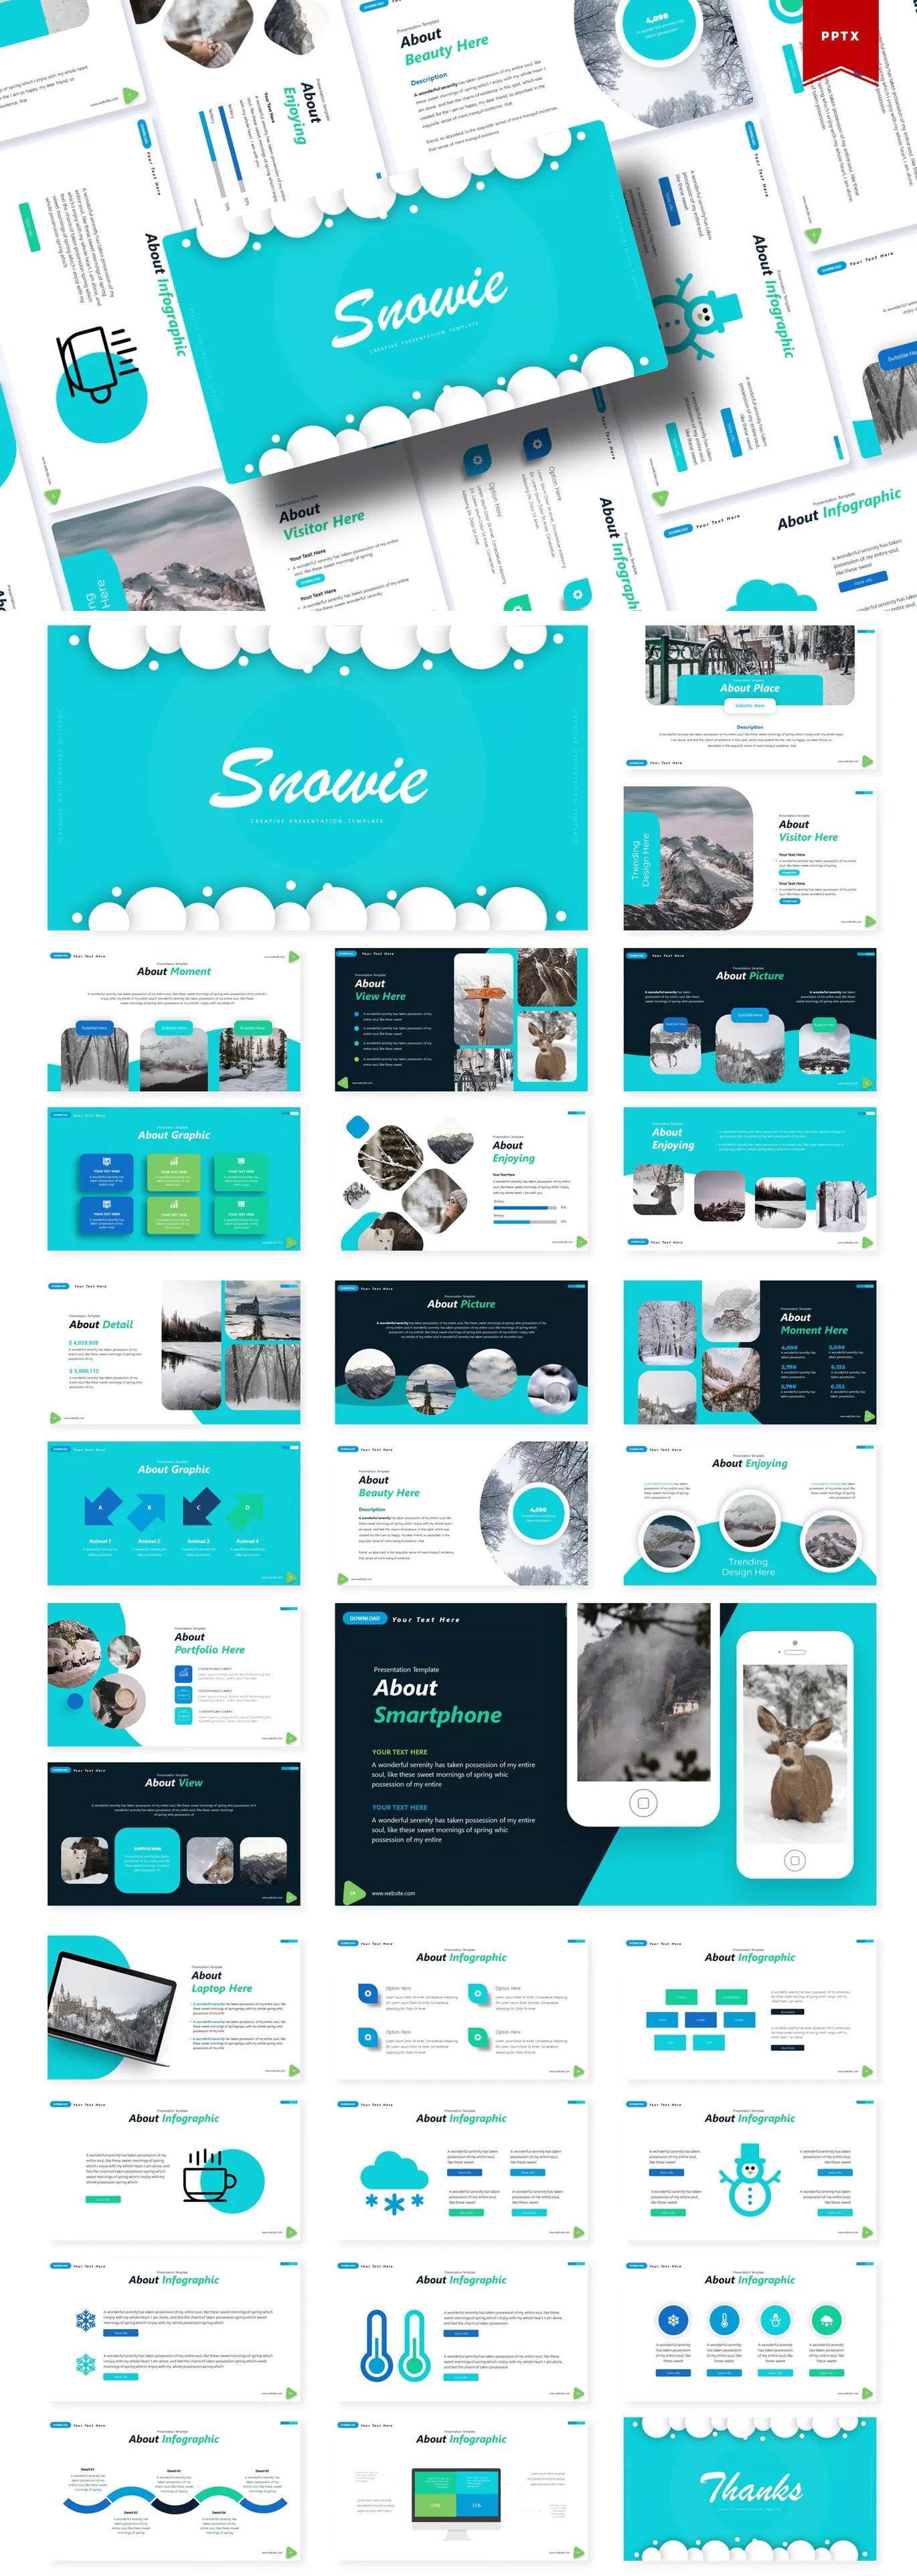 Snowie Powerpoint Template by Vunira on Envato Elements